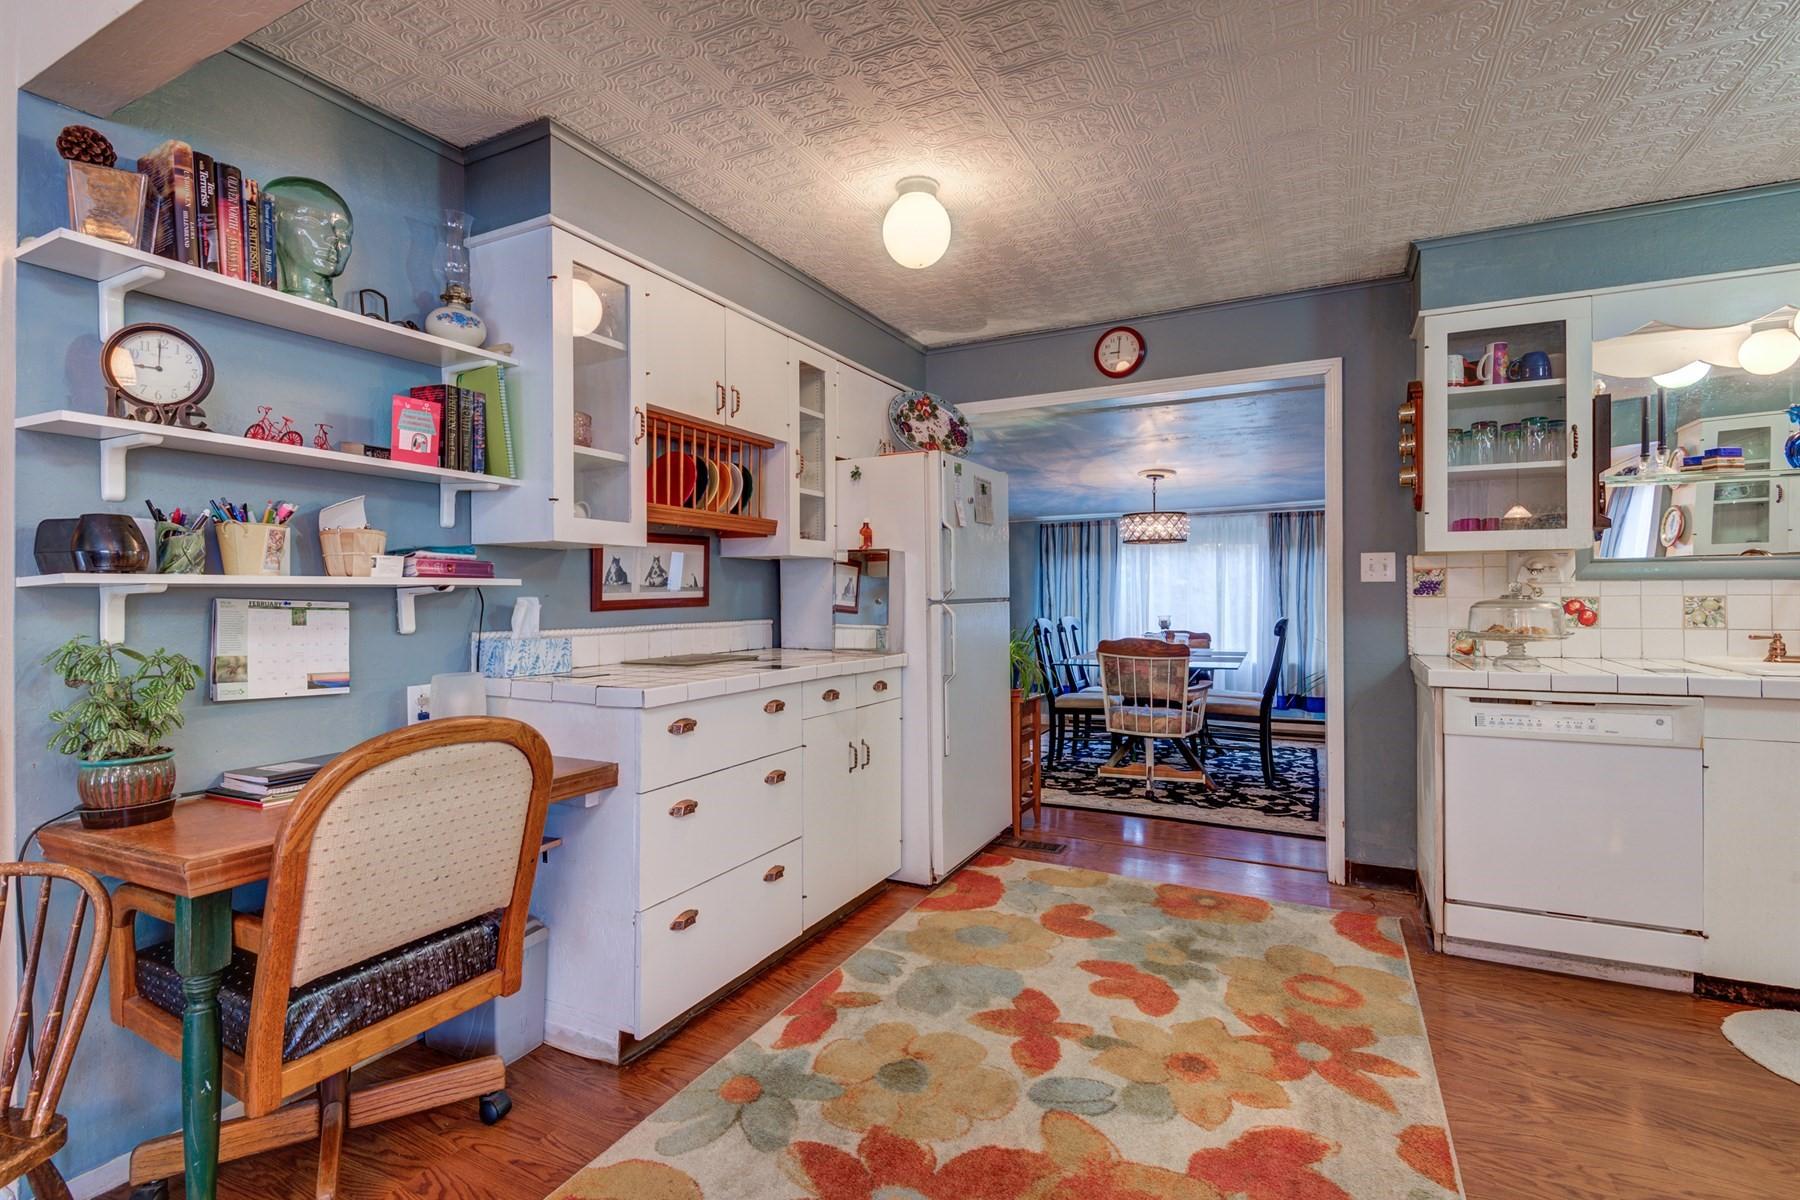 Single Family Home for Sale at 146 Barker Loop Pinehurst, Idaho, 83850 United States